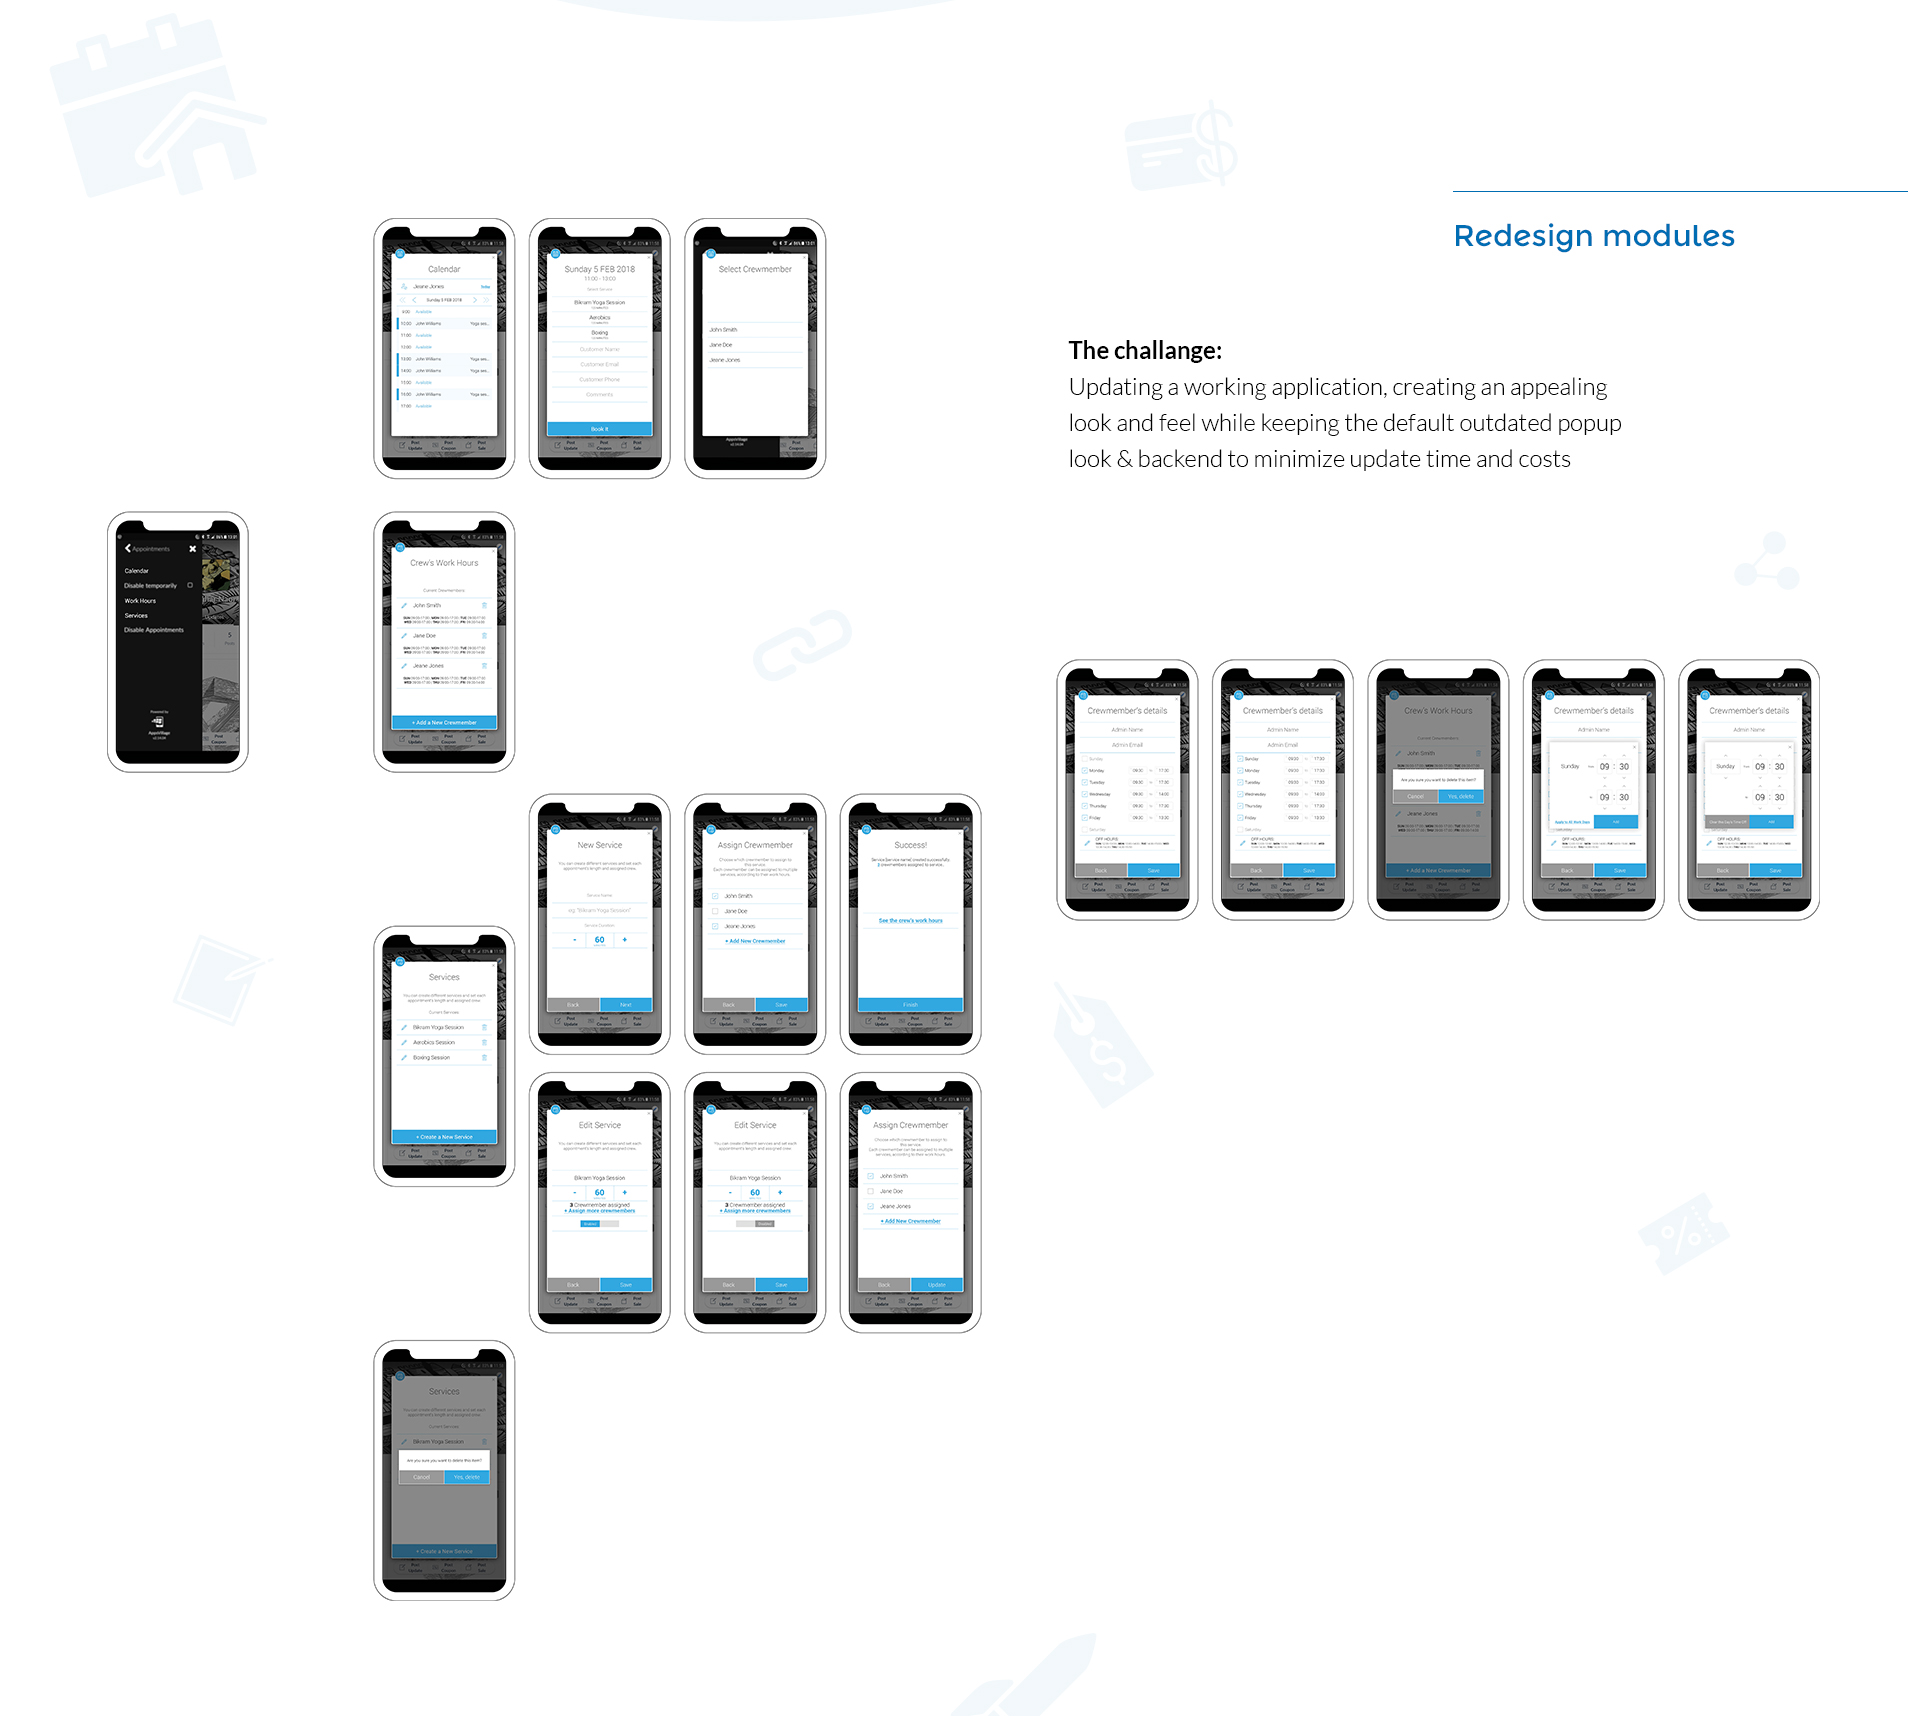 UI UX screens design עיצוב מסכי אפליקציית מובייל appsvillage